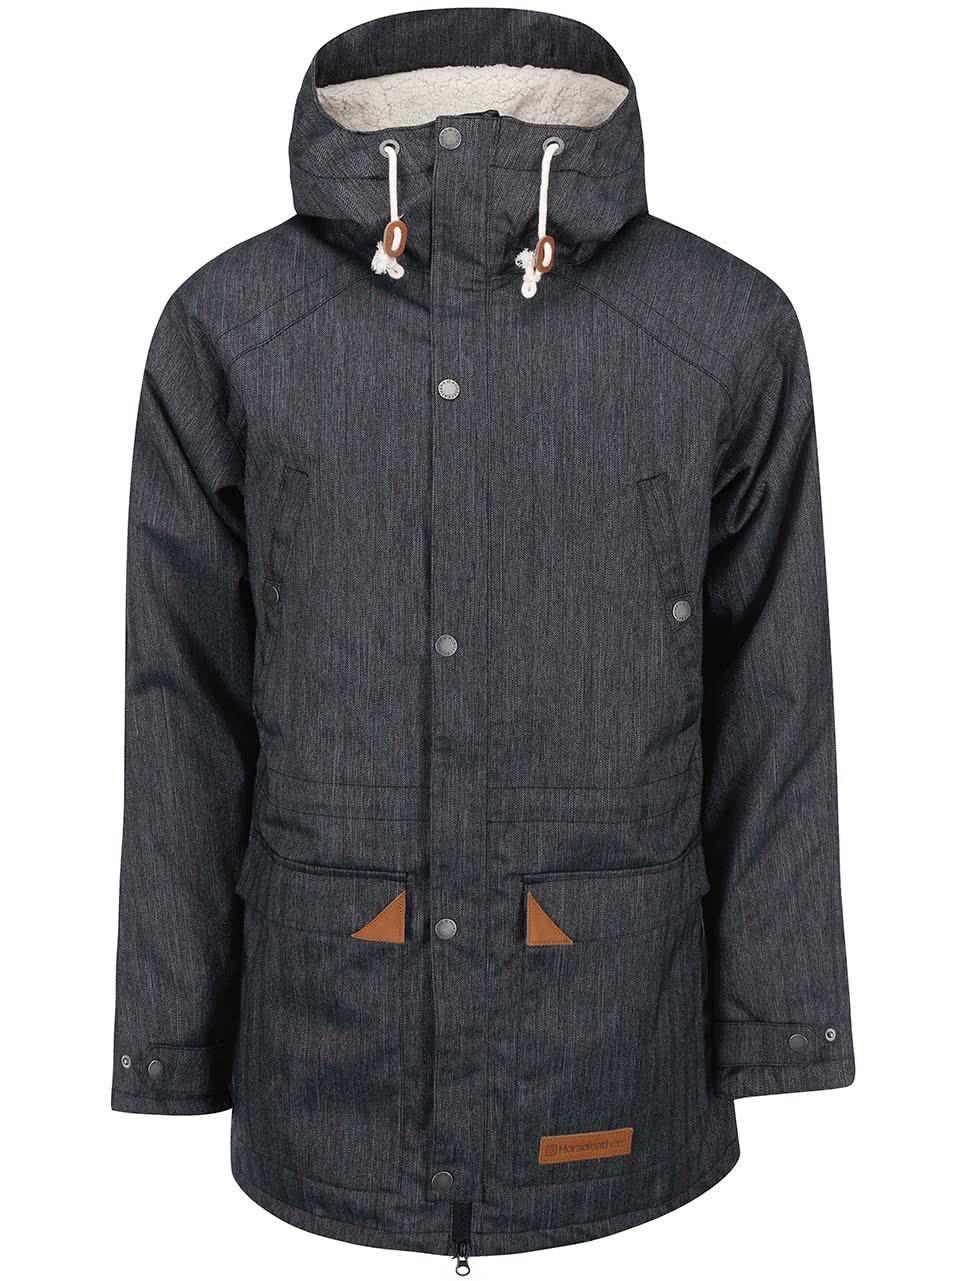 Tmavosivá pánska bunda s kapucňou Horsefeathers Daemon ... 2c26635781e